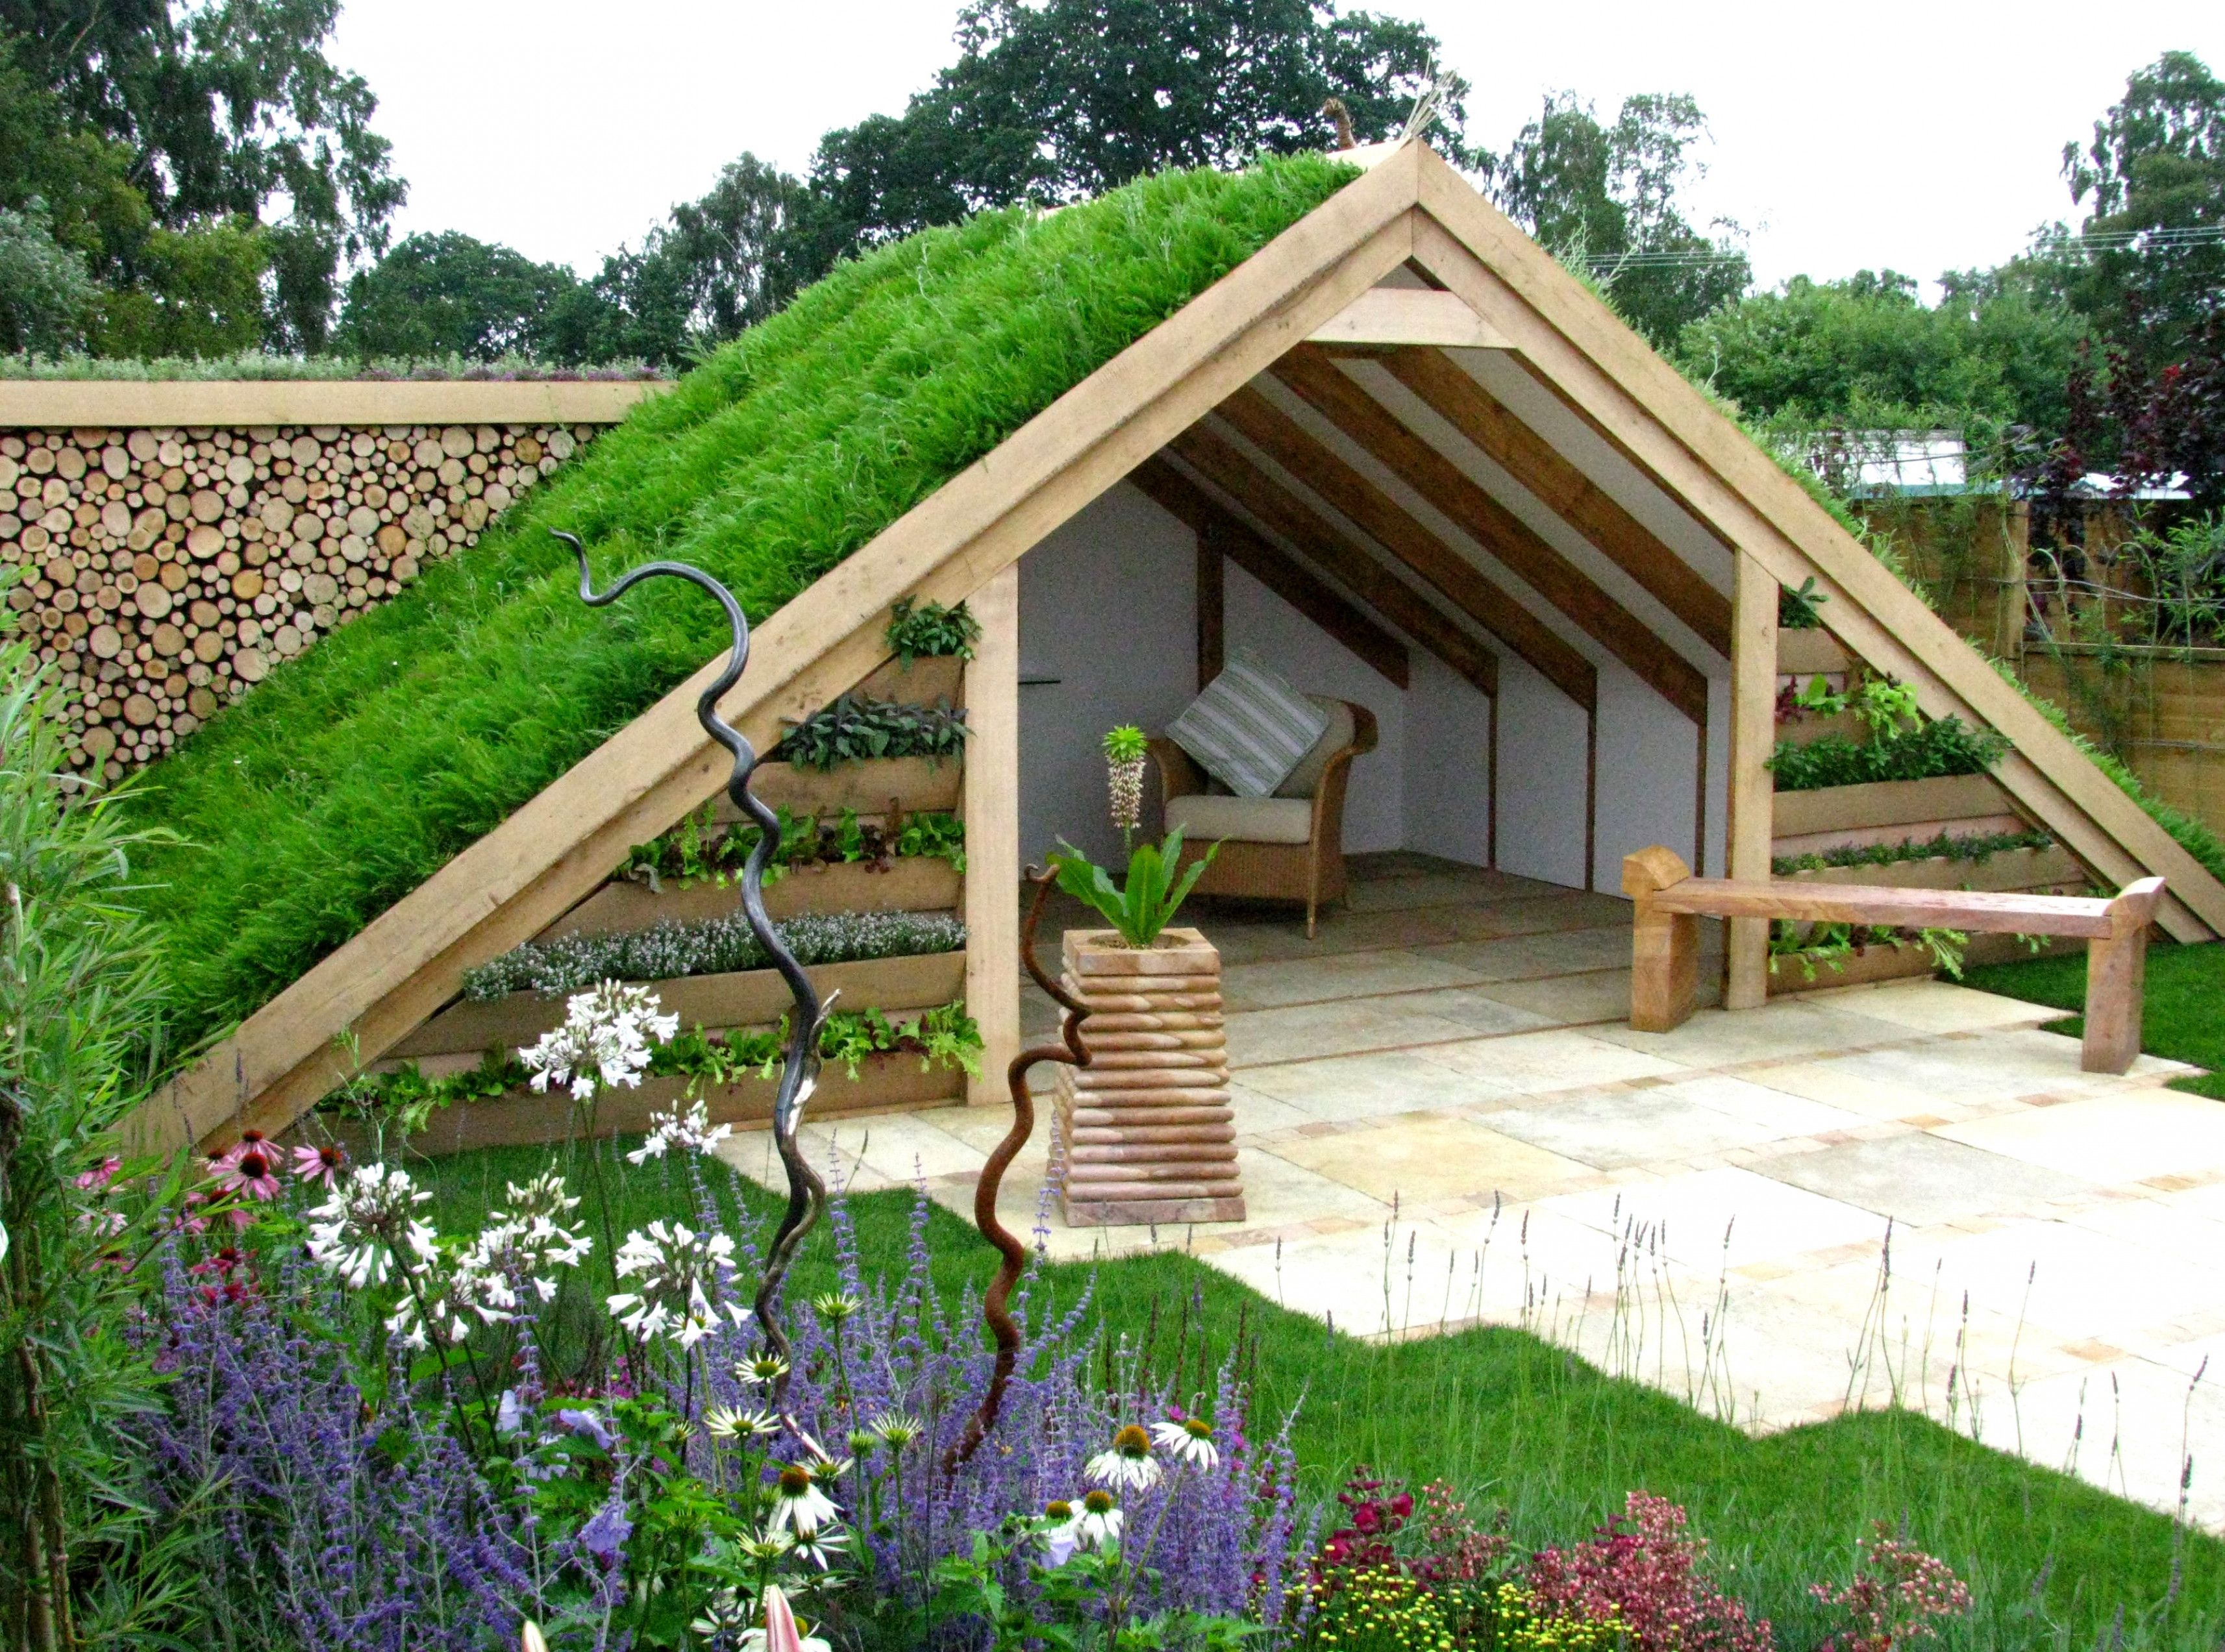 Comment Amenager Son Abri De Jardin Abris De Jardin Design